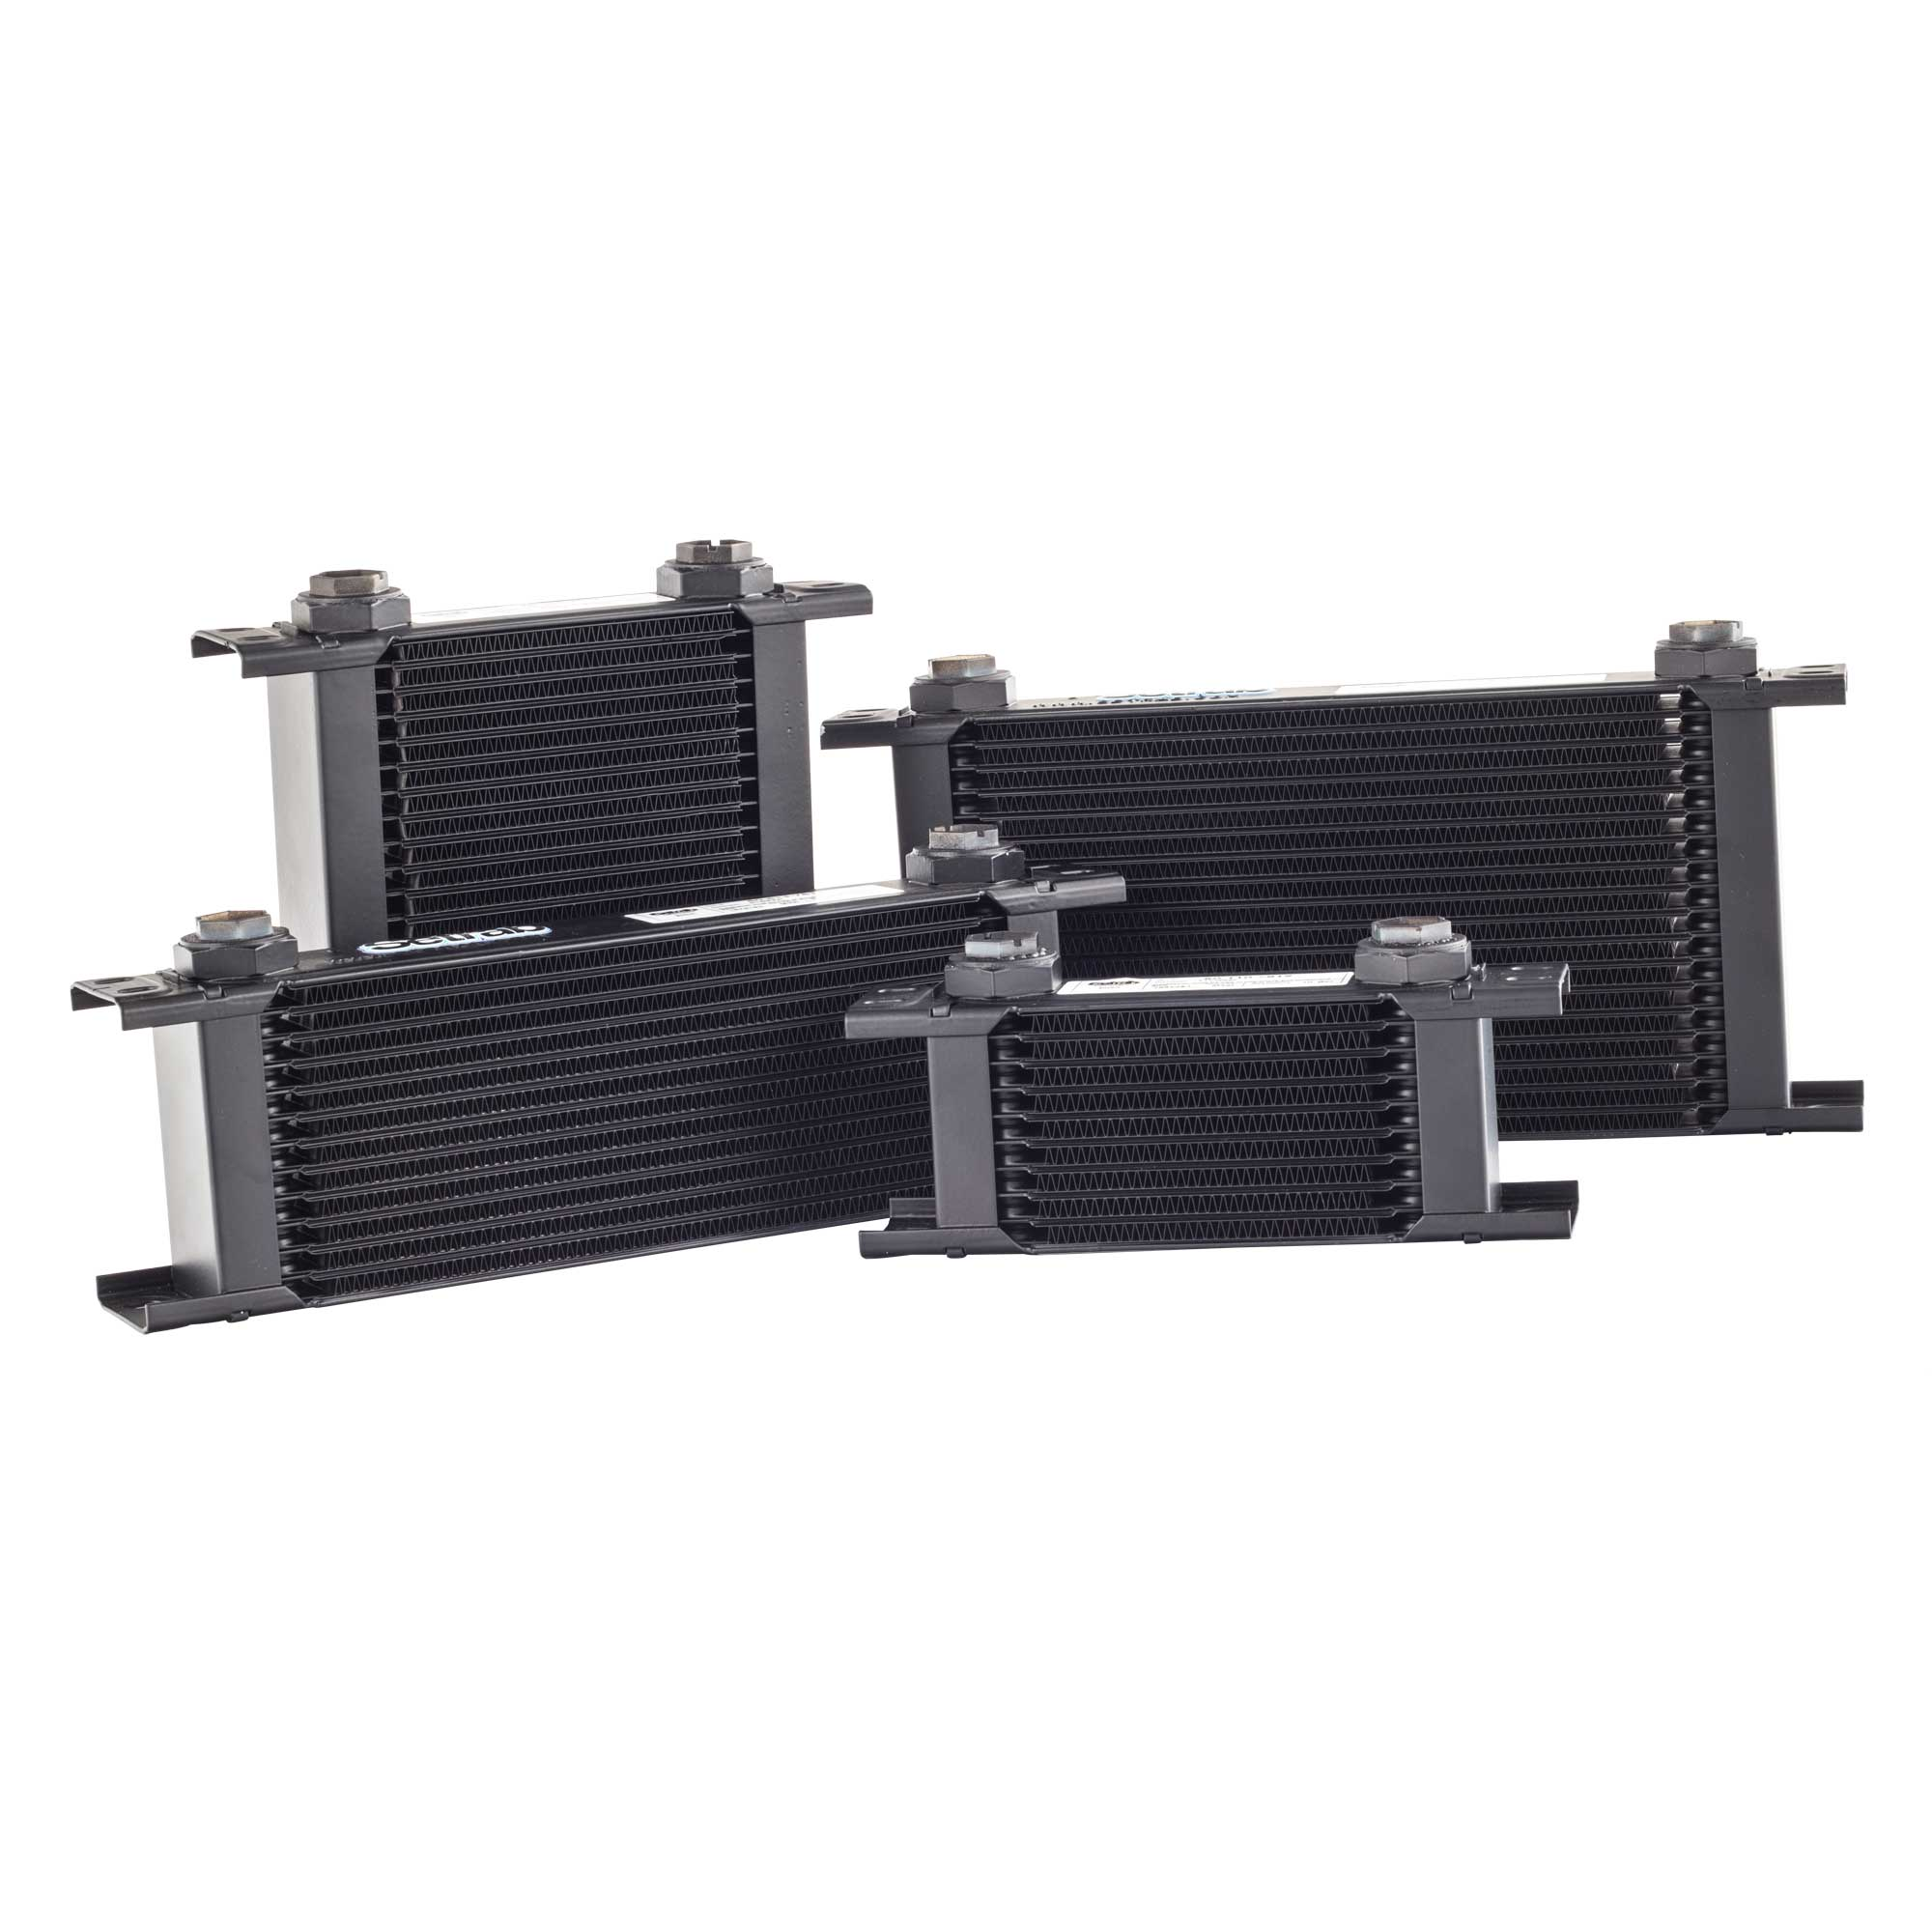 6 JIC Male Thread Setrab Proline Oil Cooler M22 Adapter//Adaptor//Fitting AN6 //